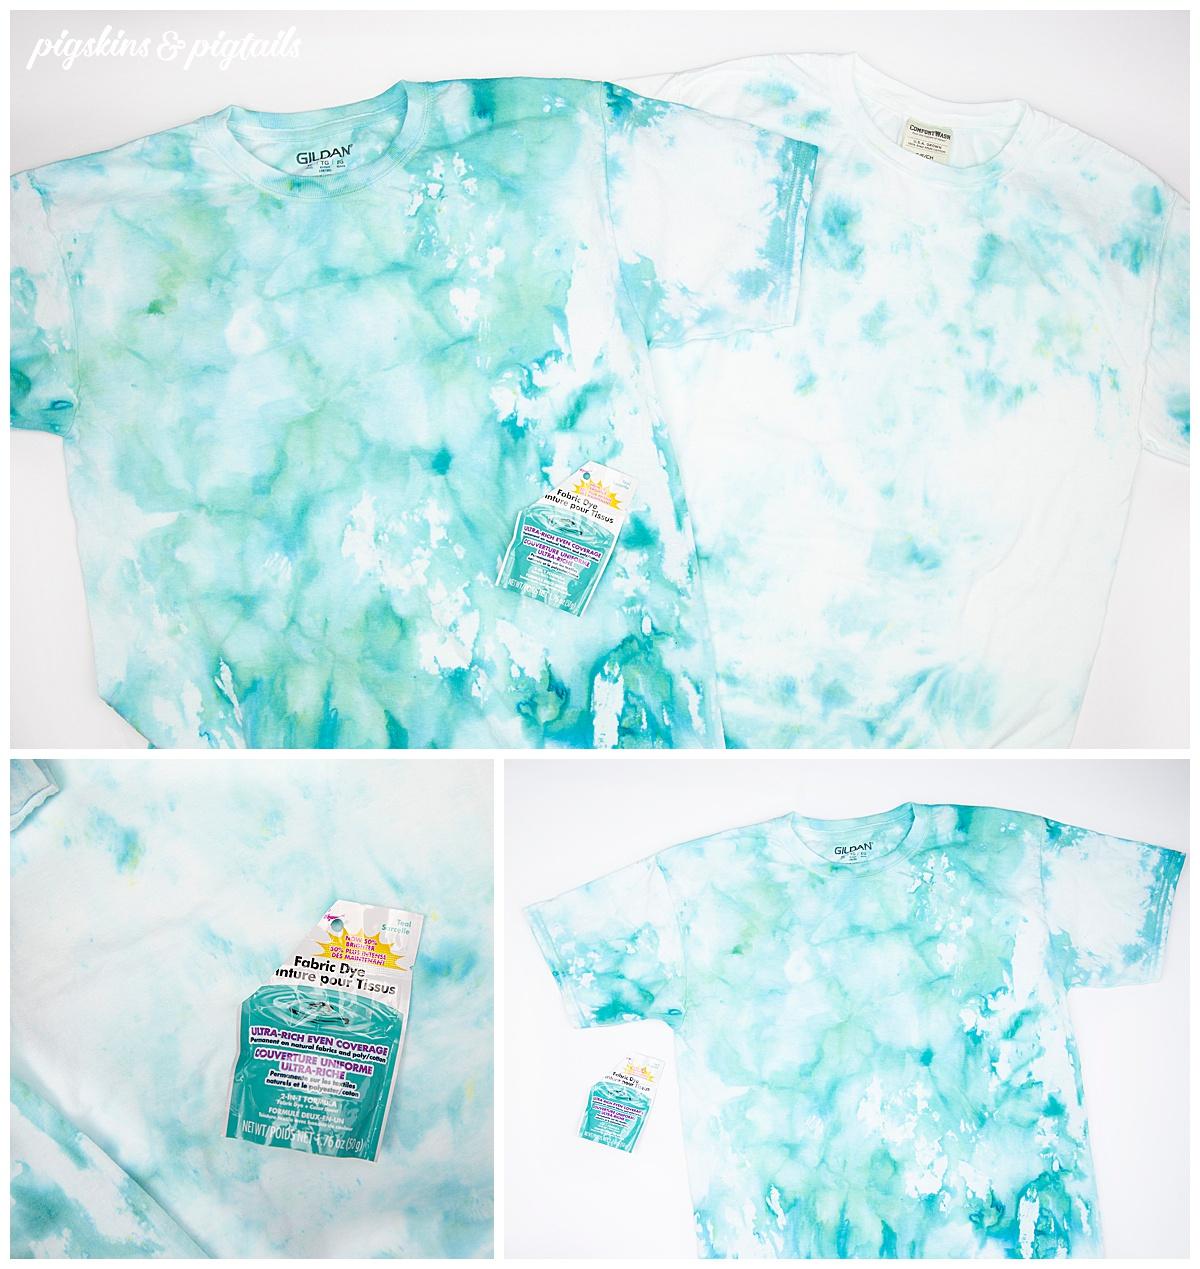 teal ice dye shirt idea